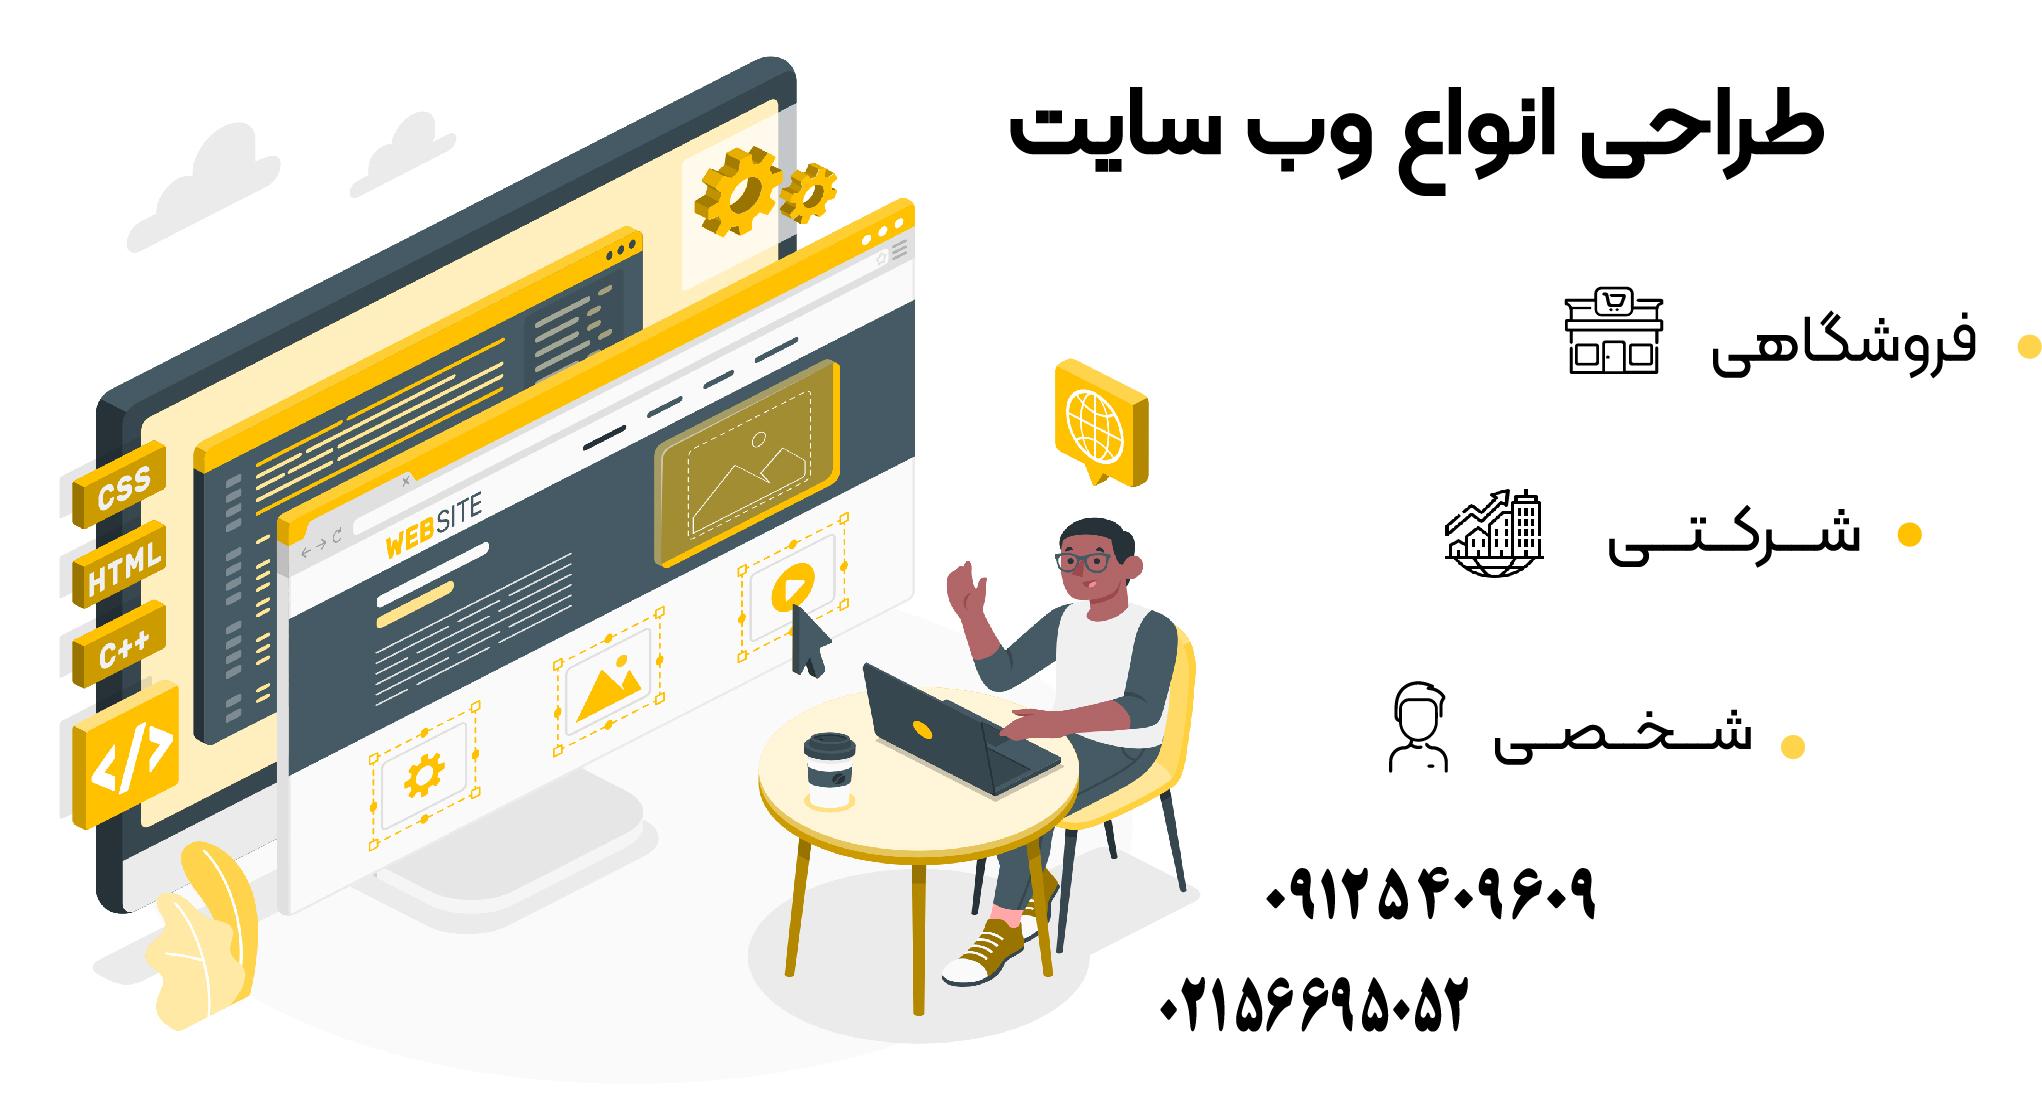 طراحی وبسایت در اسلامشهر